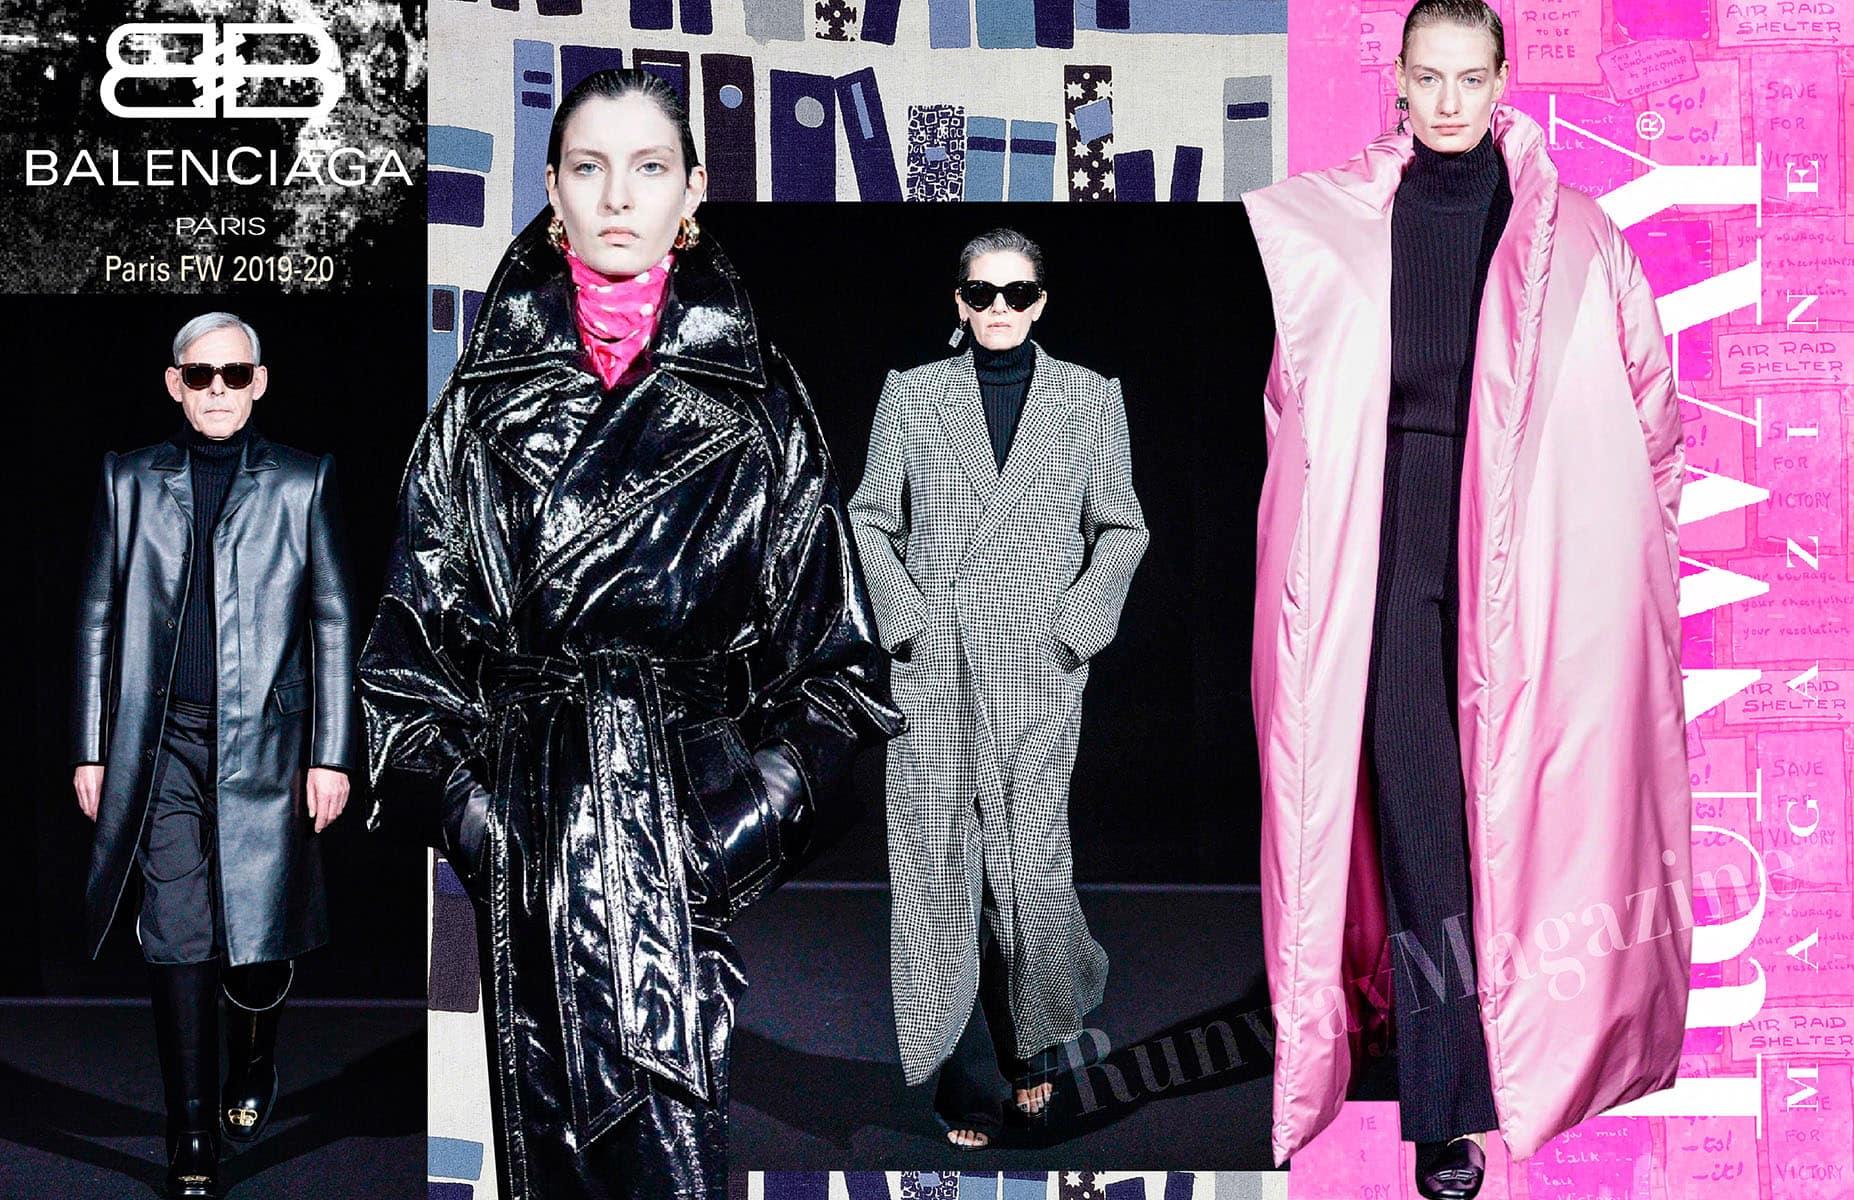 Balenciaga Autunno Inverno 2019-2020 Parigi di RUNWAY MAGAZINE